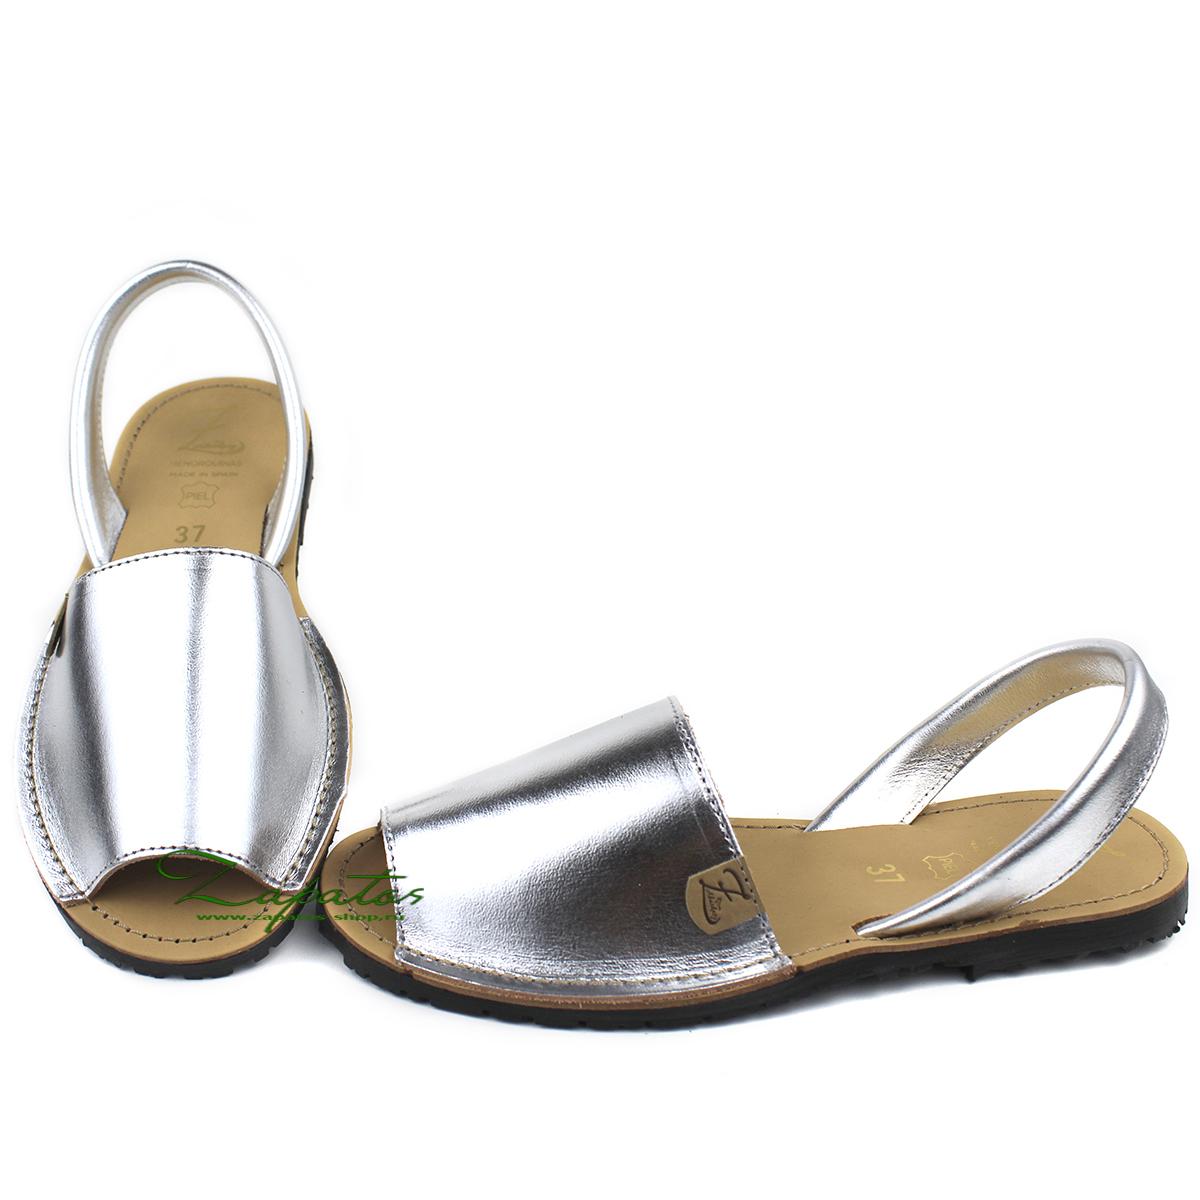 Абаркасы AB. Zapatos 4364 PLATA